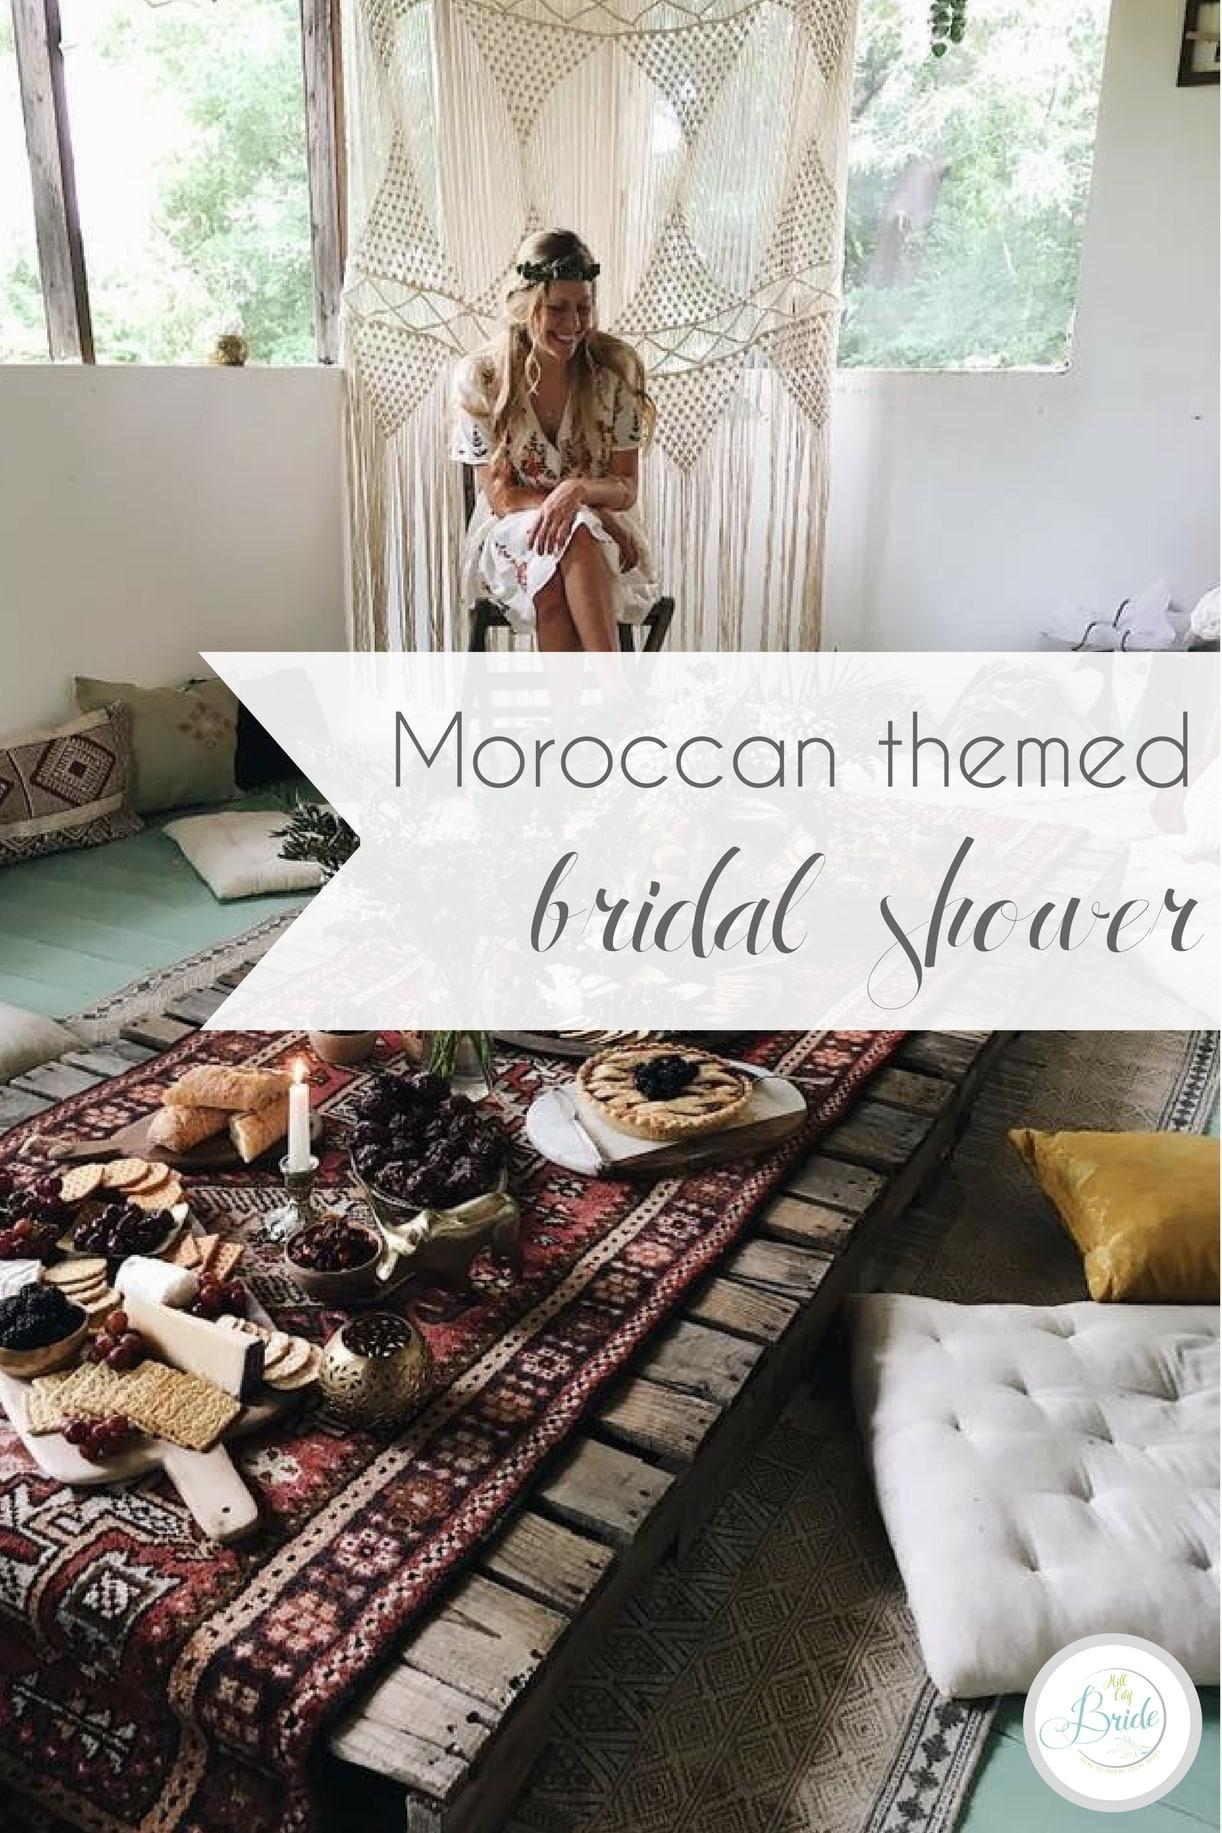 Moroccan Themed Bridal Shower » Hill City Bride | Virginia Wedding Blog